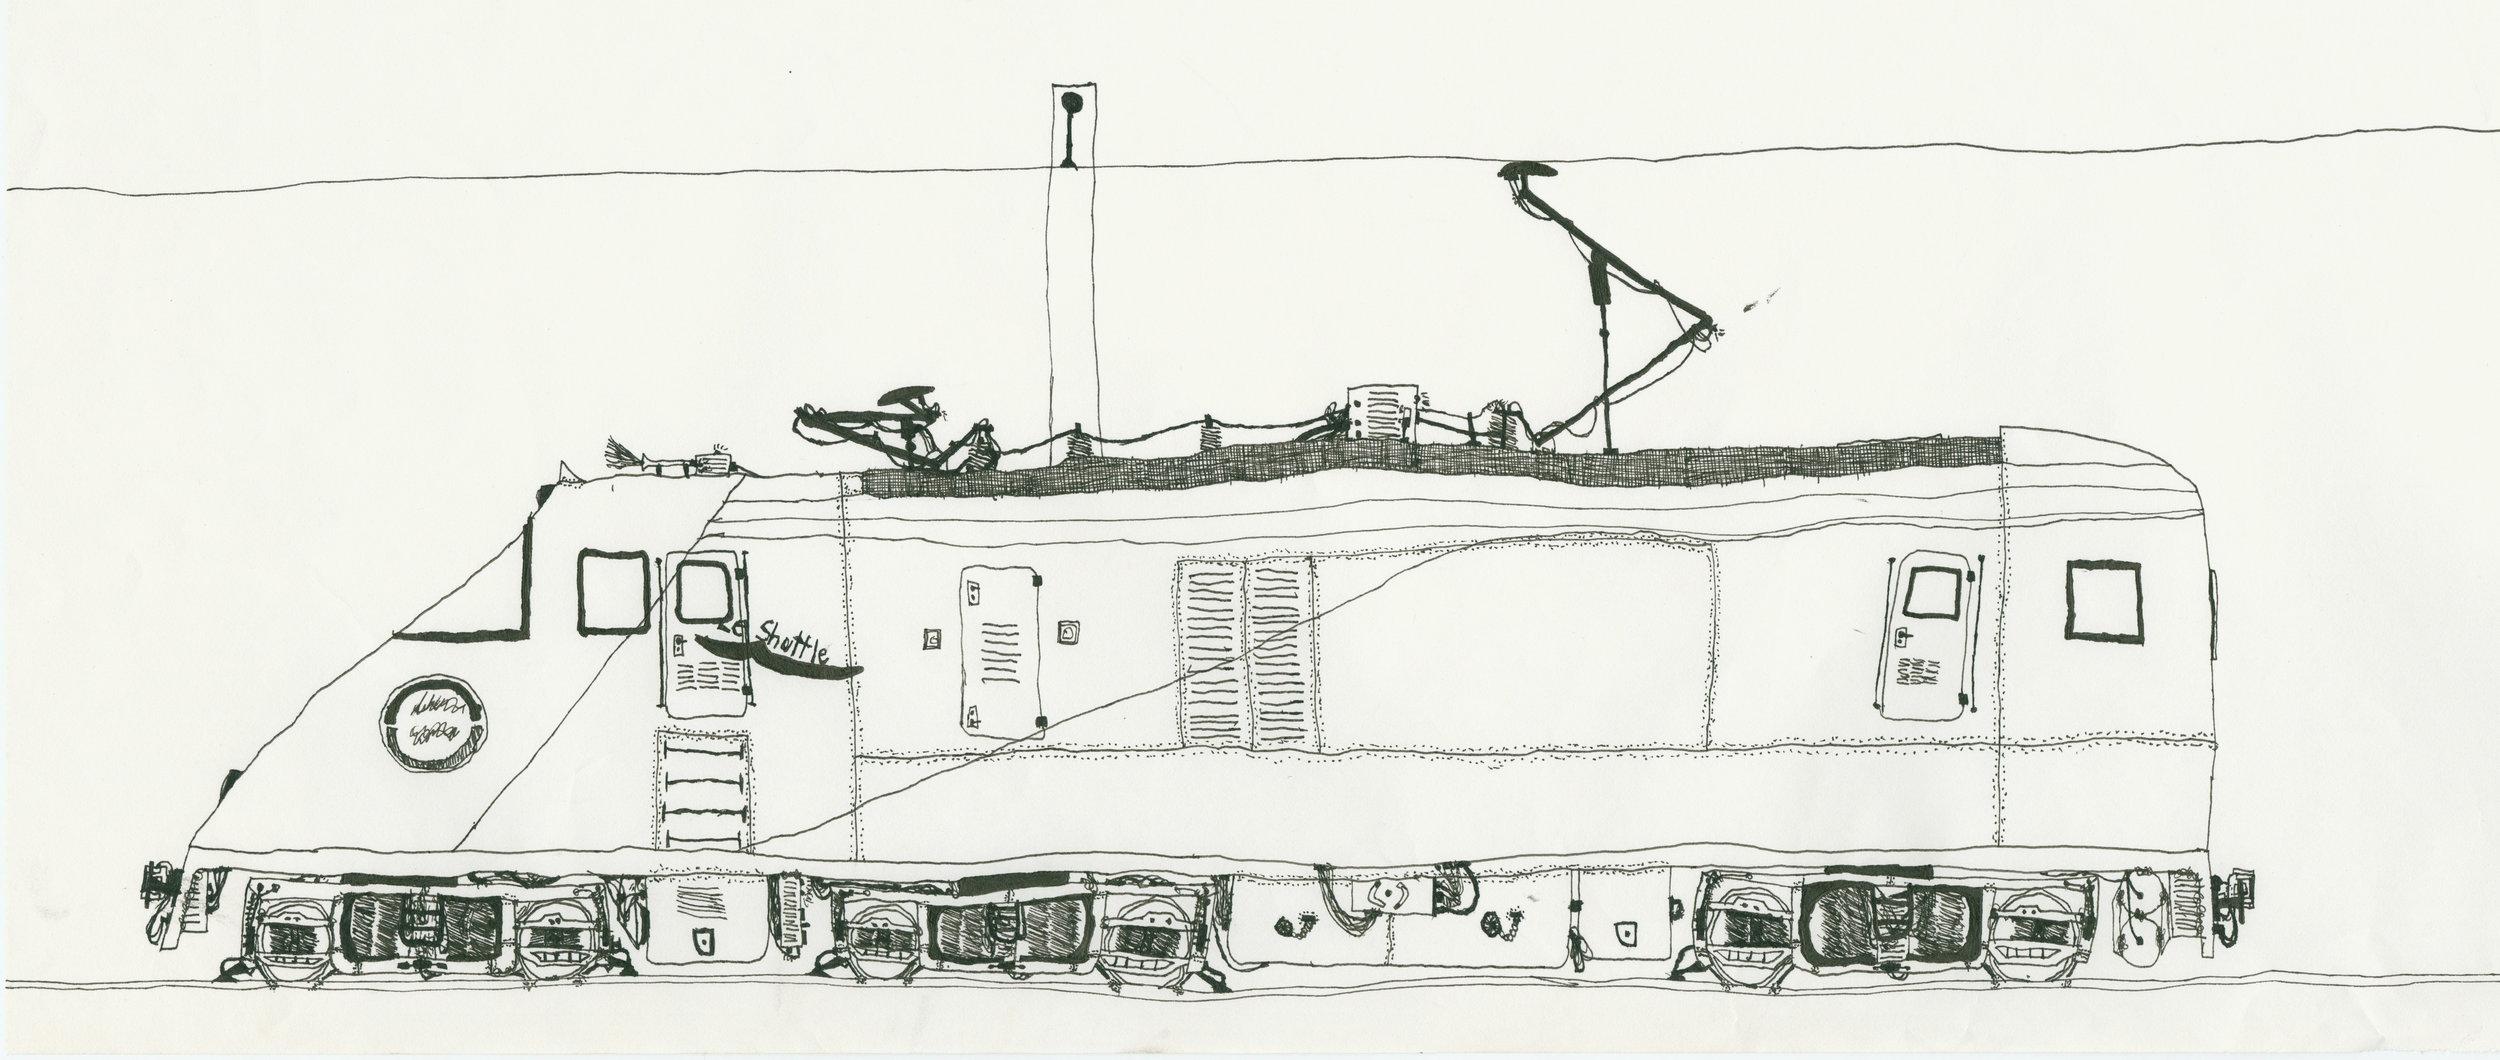 2000.01 - 001 - Train drawing.pdf0000.jpg